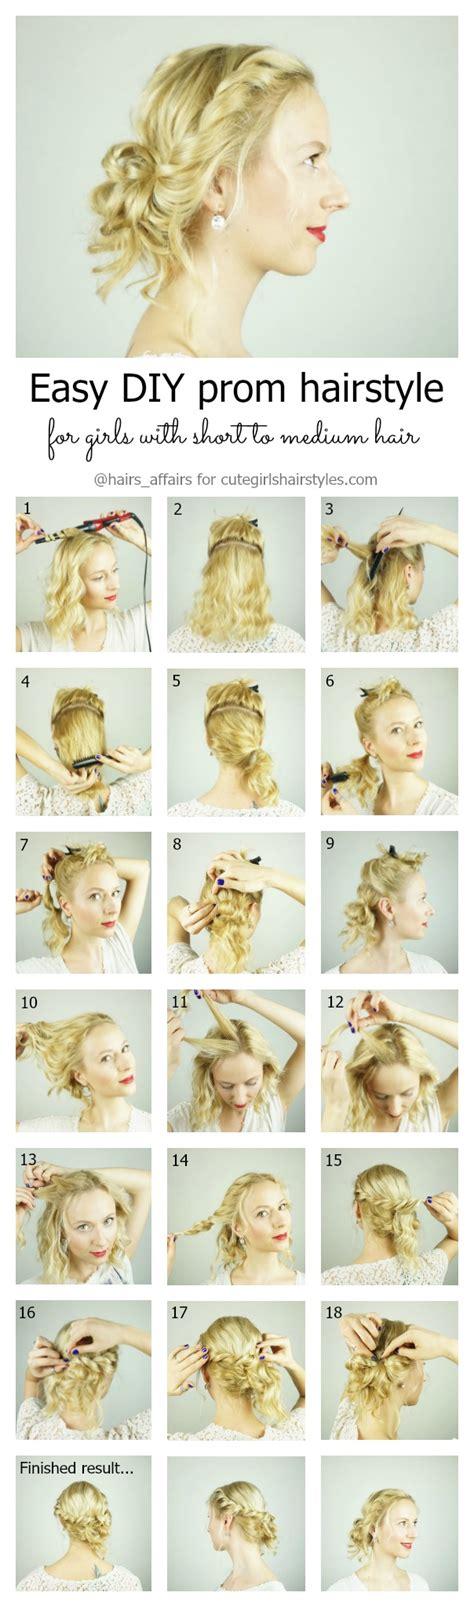 easy diy prom hairstyle  girls  short  medium